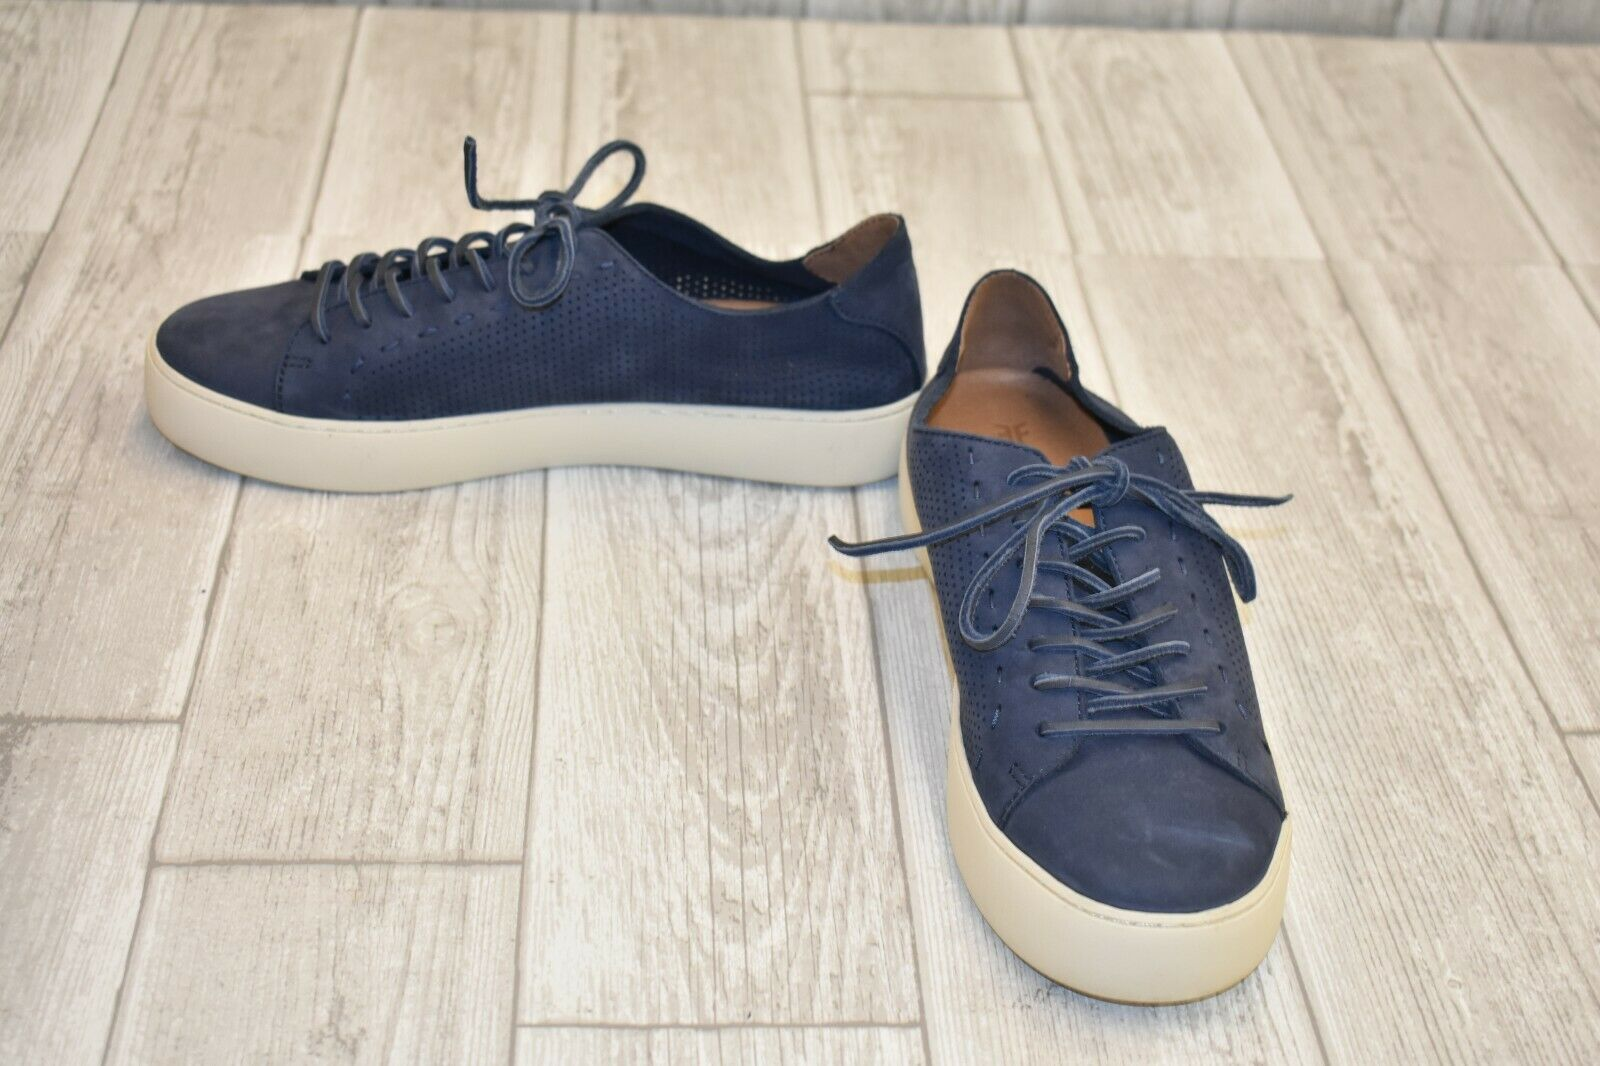 Frye Lena Perf Low Lace Sneaker - Women's Size 8.5M, Indigo